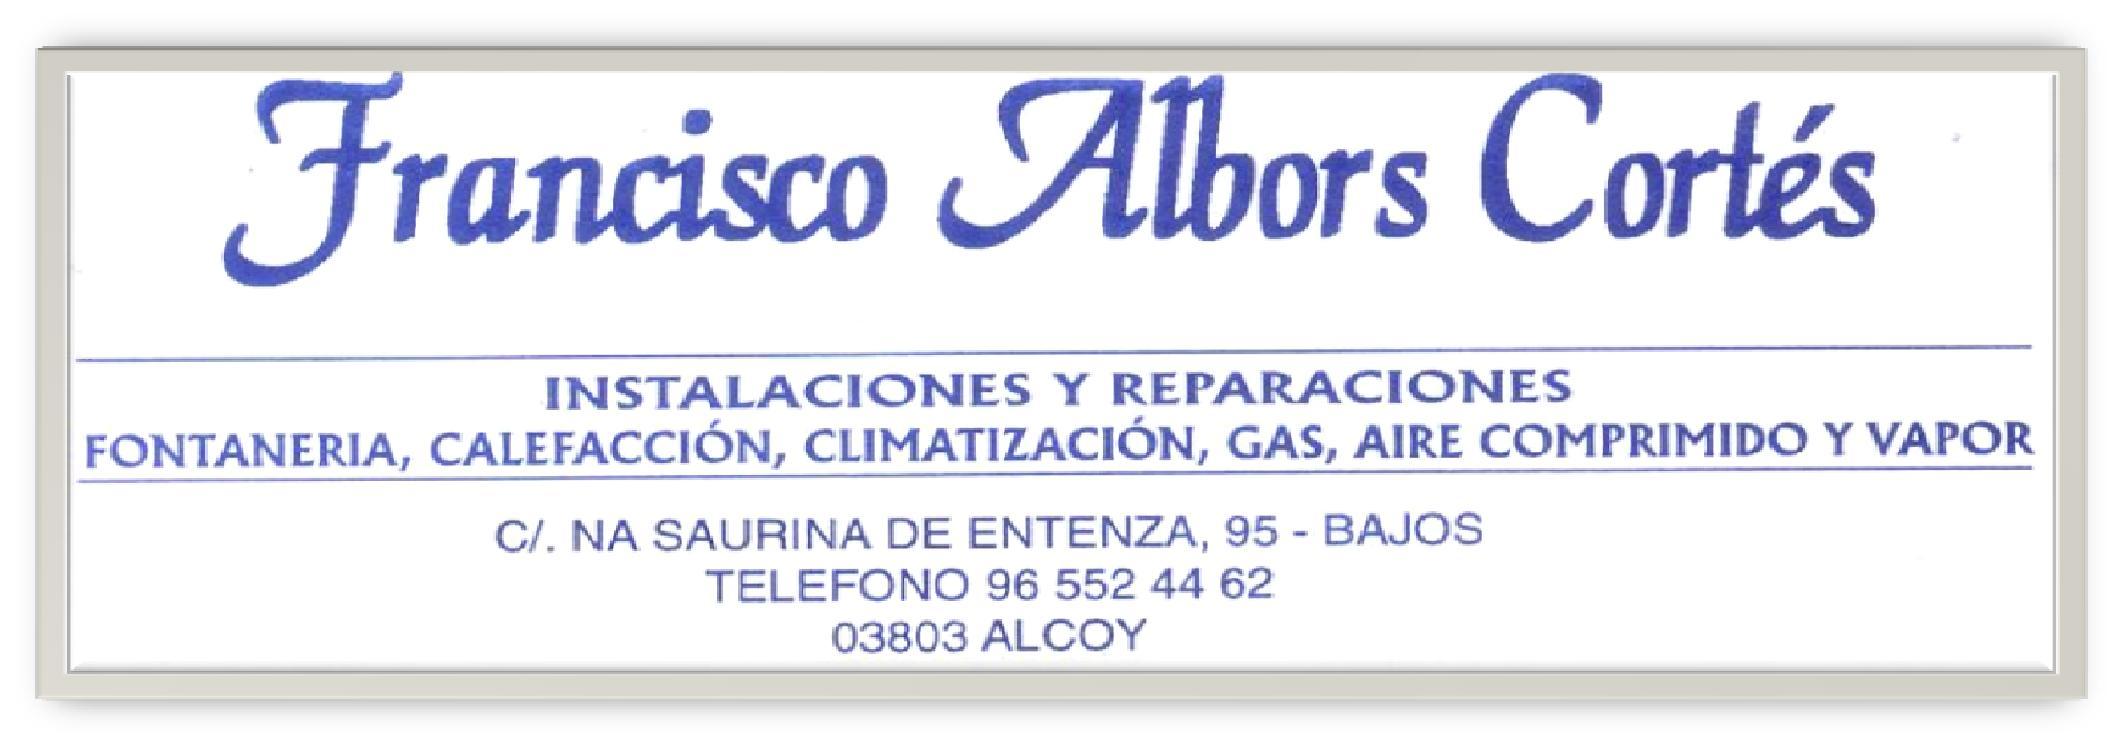 Francisco Albors Cortes